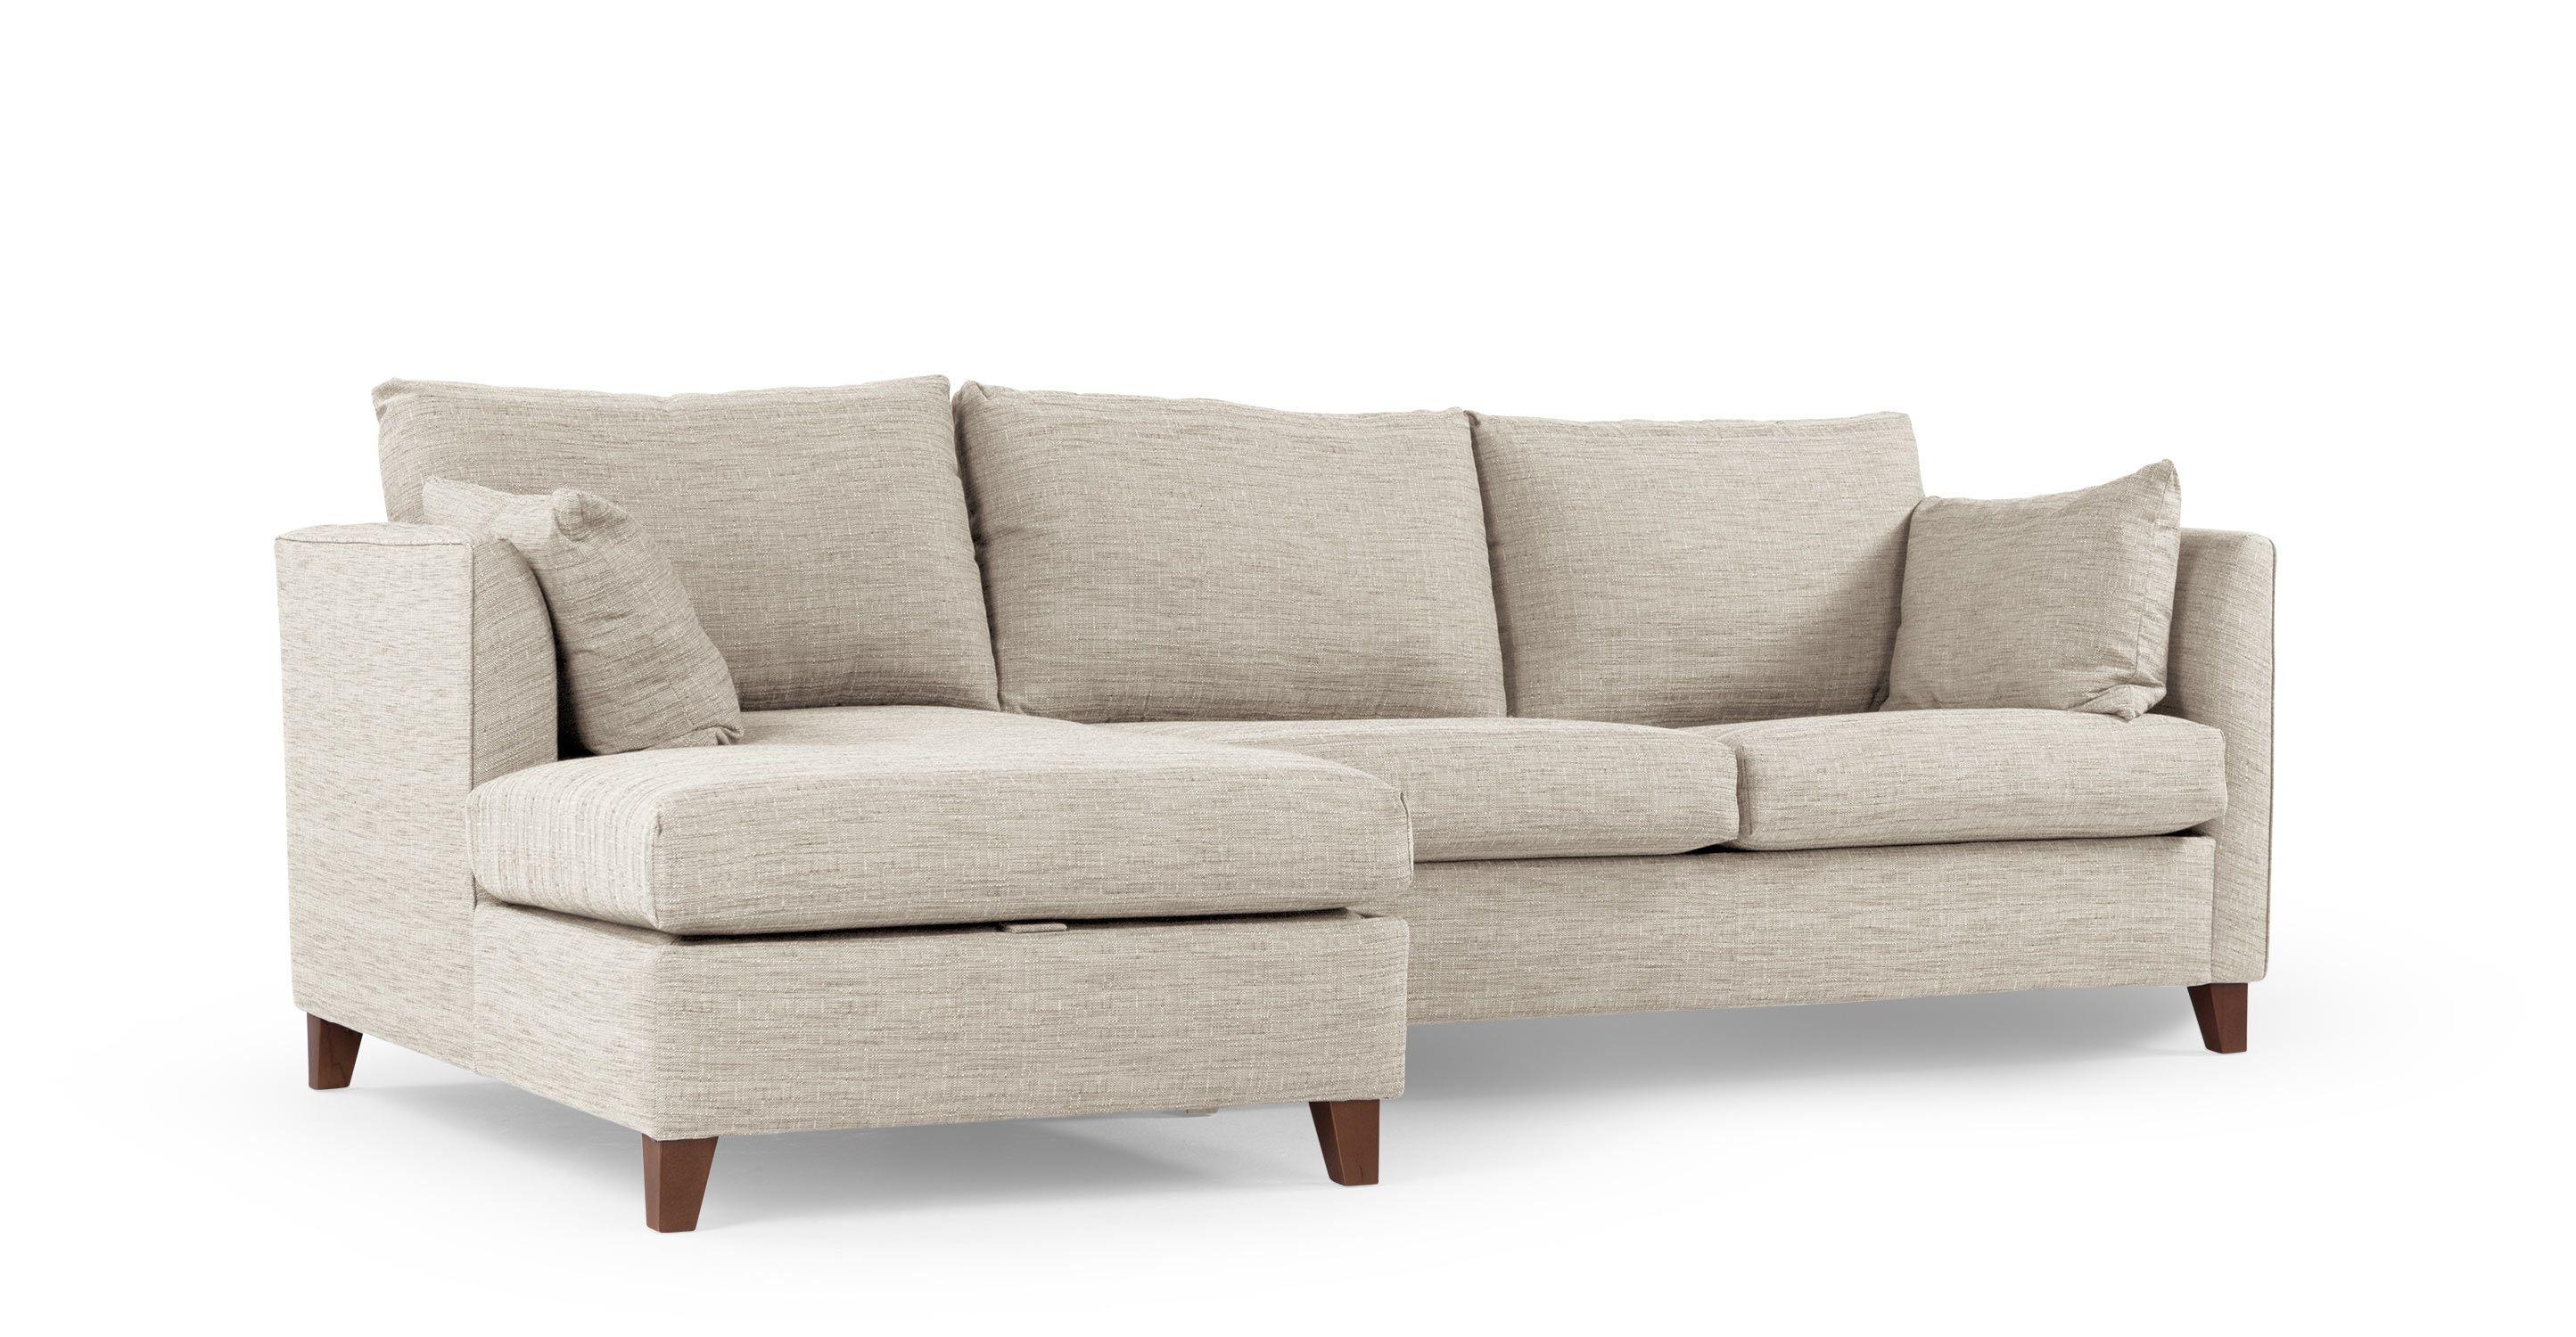 Bari Corner Sofa With Storage Space And Chaise Lounge Left Malva Beige Made Com Muebles Interiores Y Casas